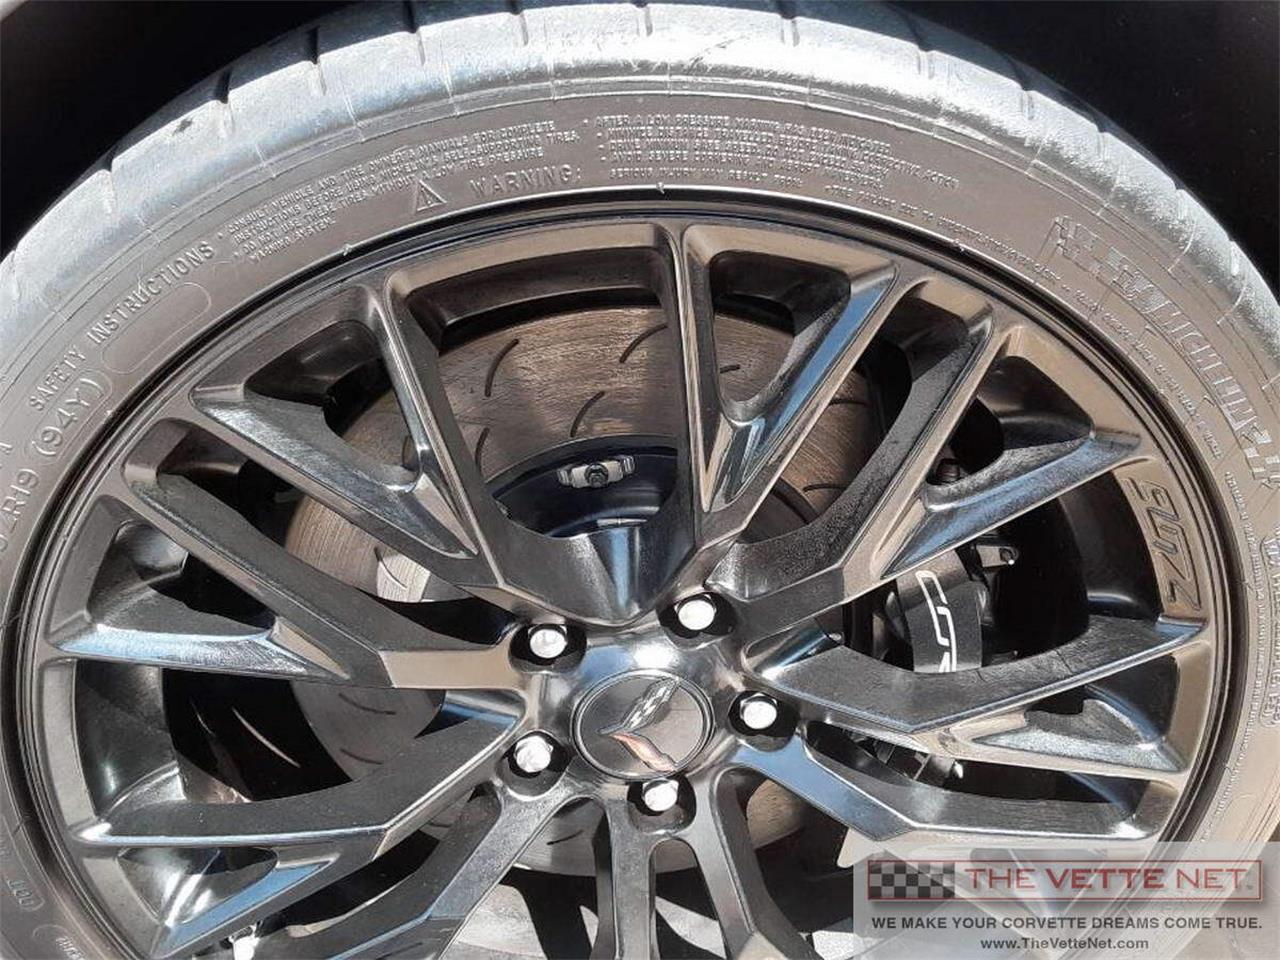 2019 Chevrolet Corvette (CC-1389732) for sale in Sarasota, Florida